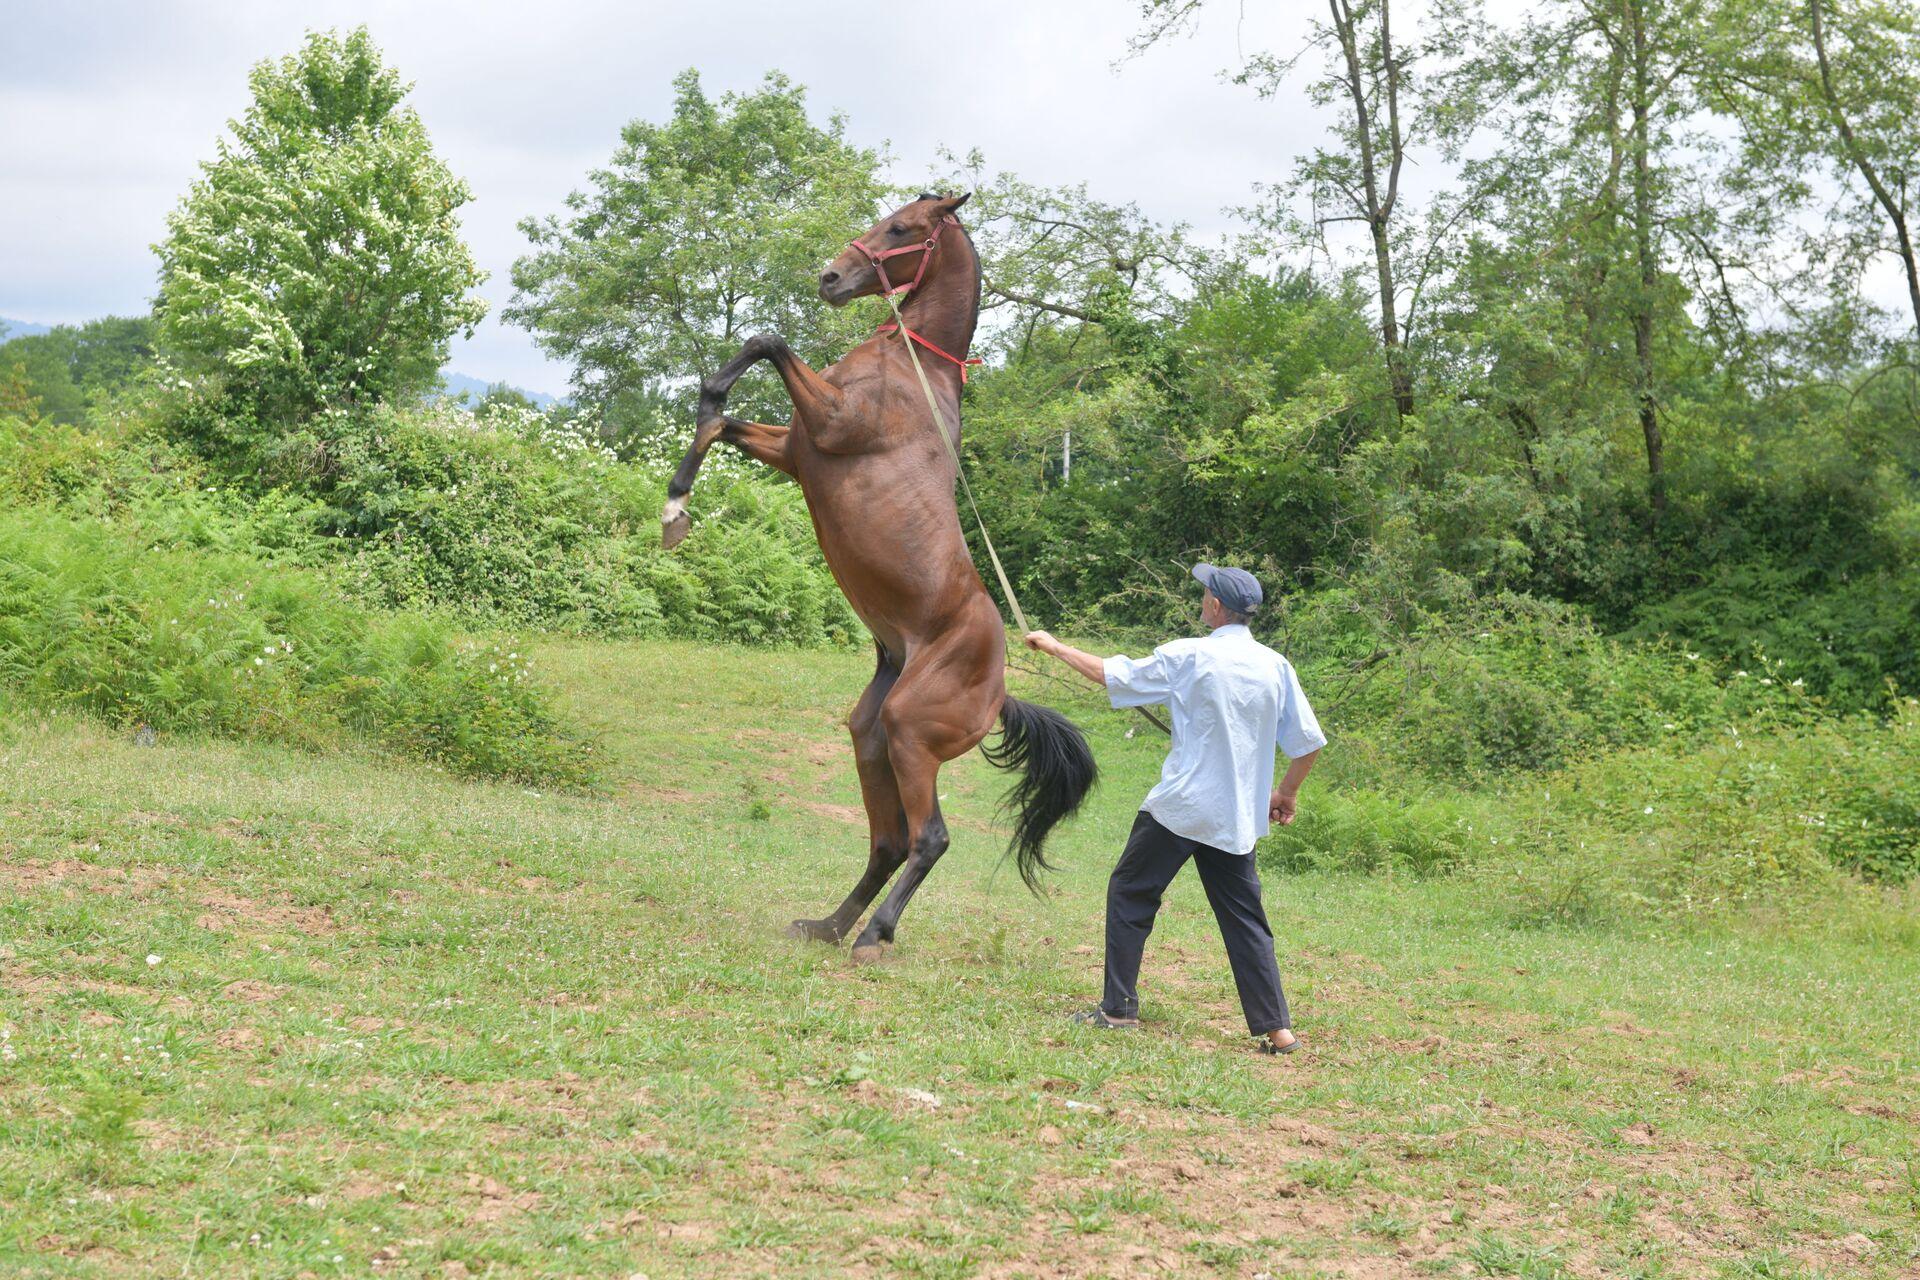 Мастер по апацхам и мастер спорта по конному спорту Отар Чанба - Sputnik Абхазия, 1920, 12.10.2021